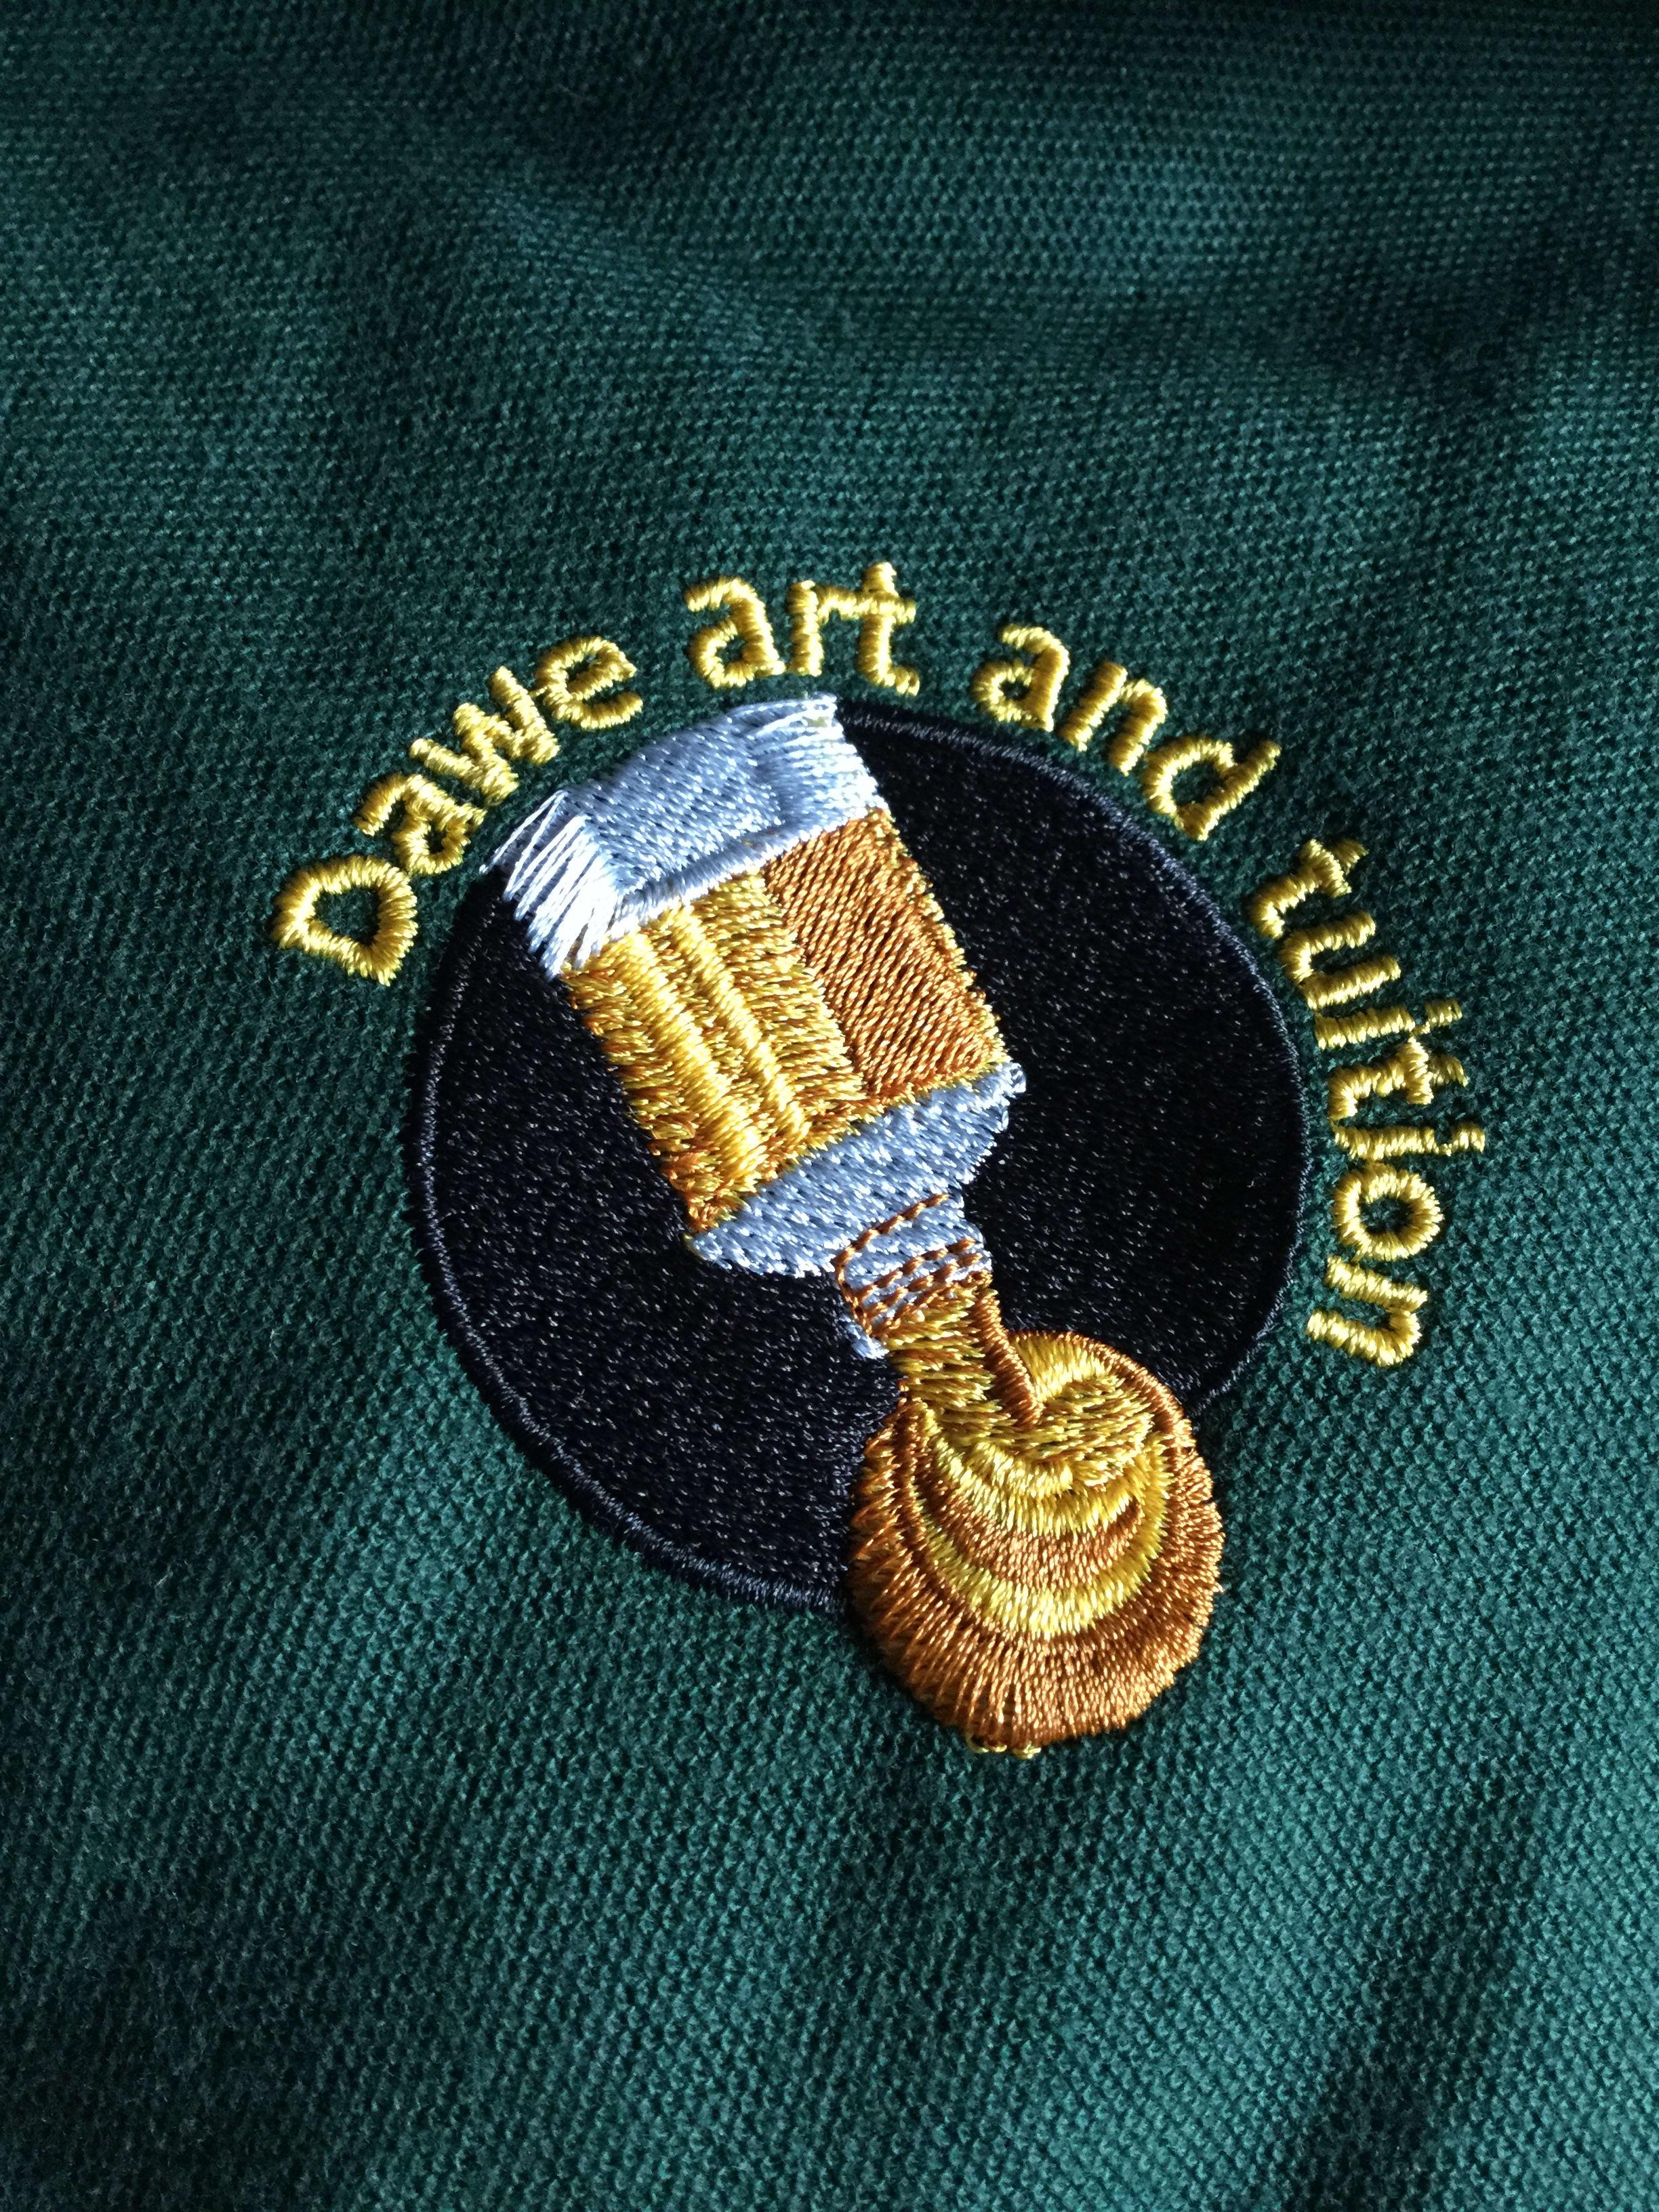 Dawe Art And Tuition